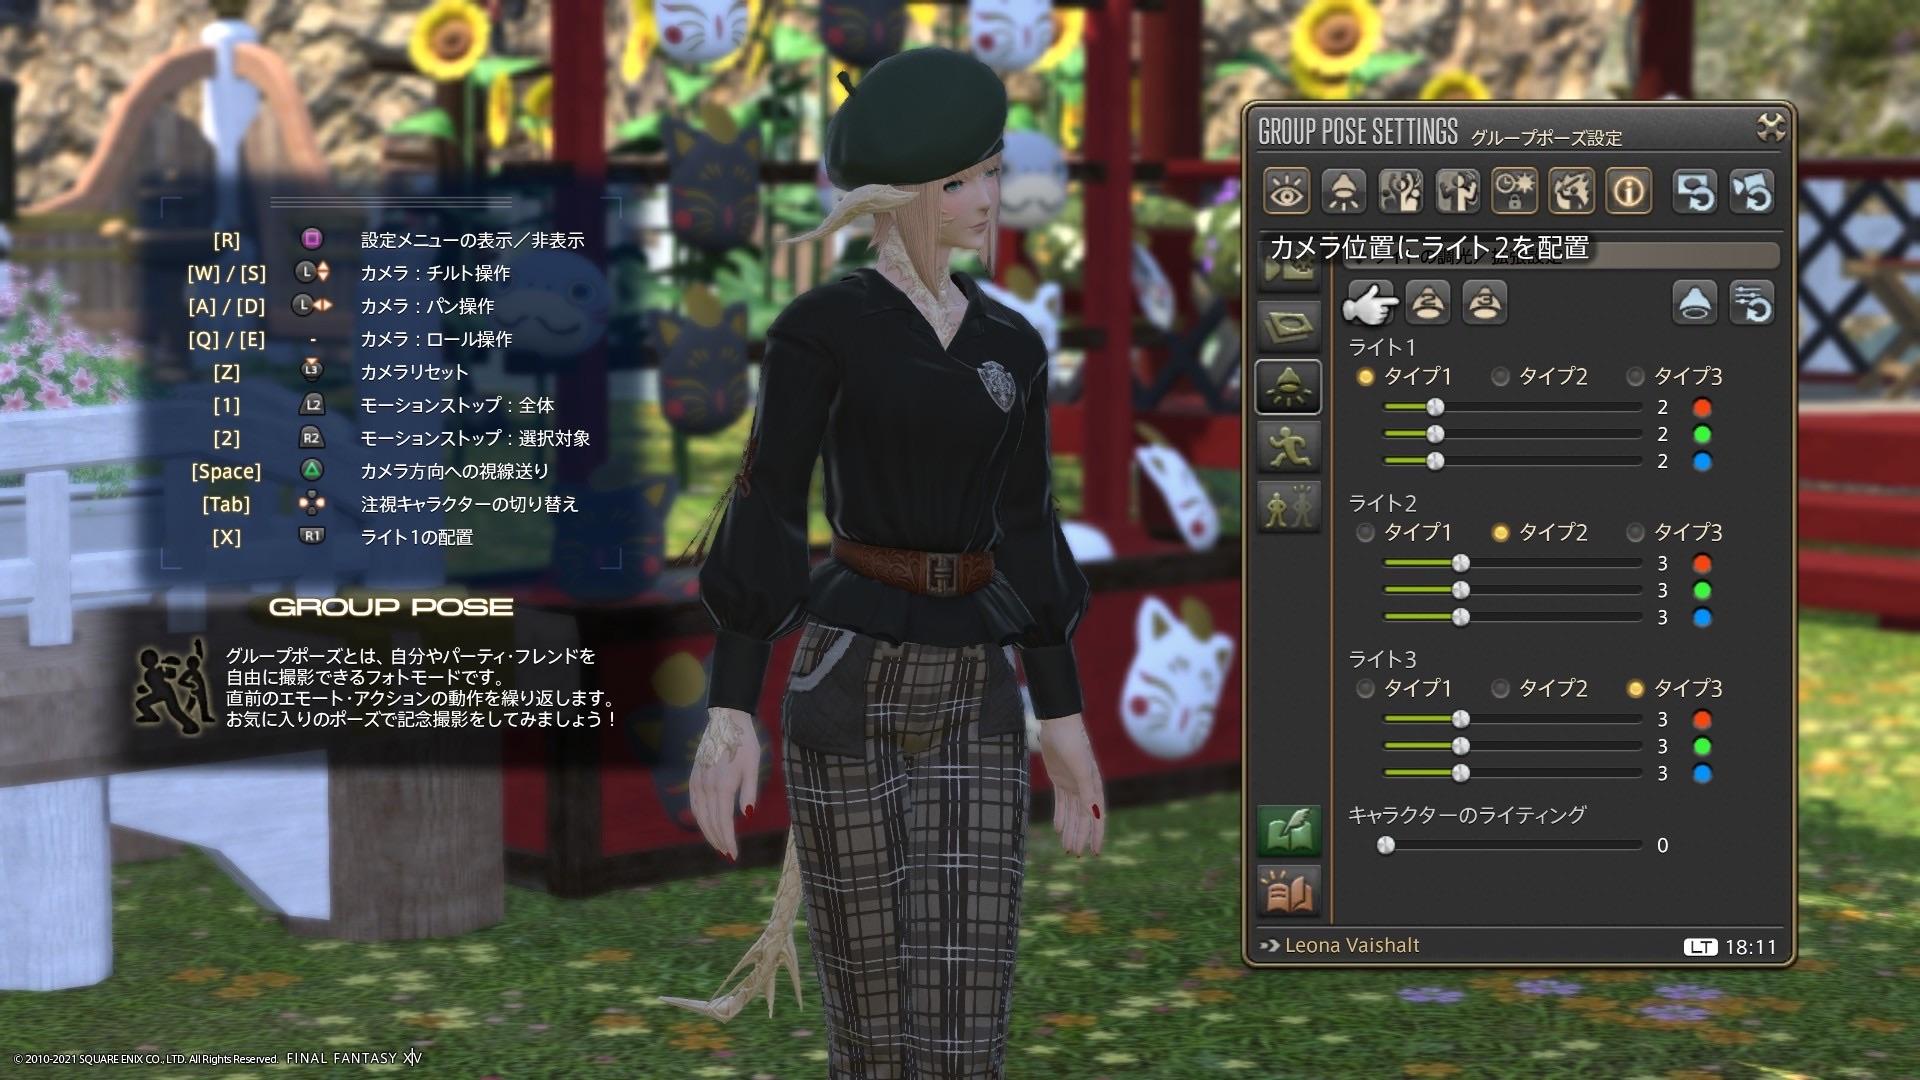 f:id:leonanoblog:20210912181410j:plain